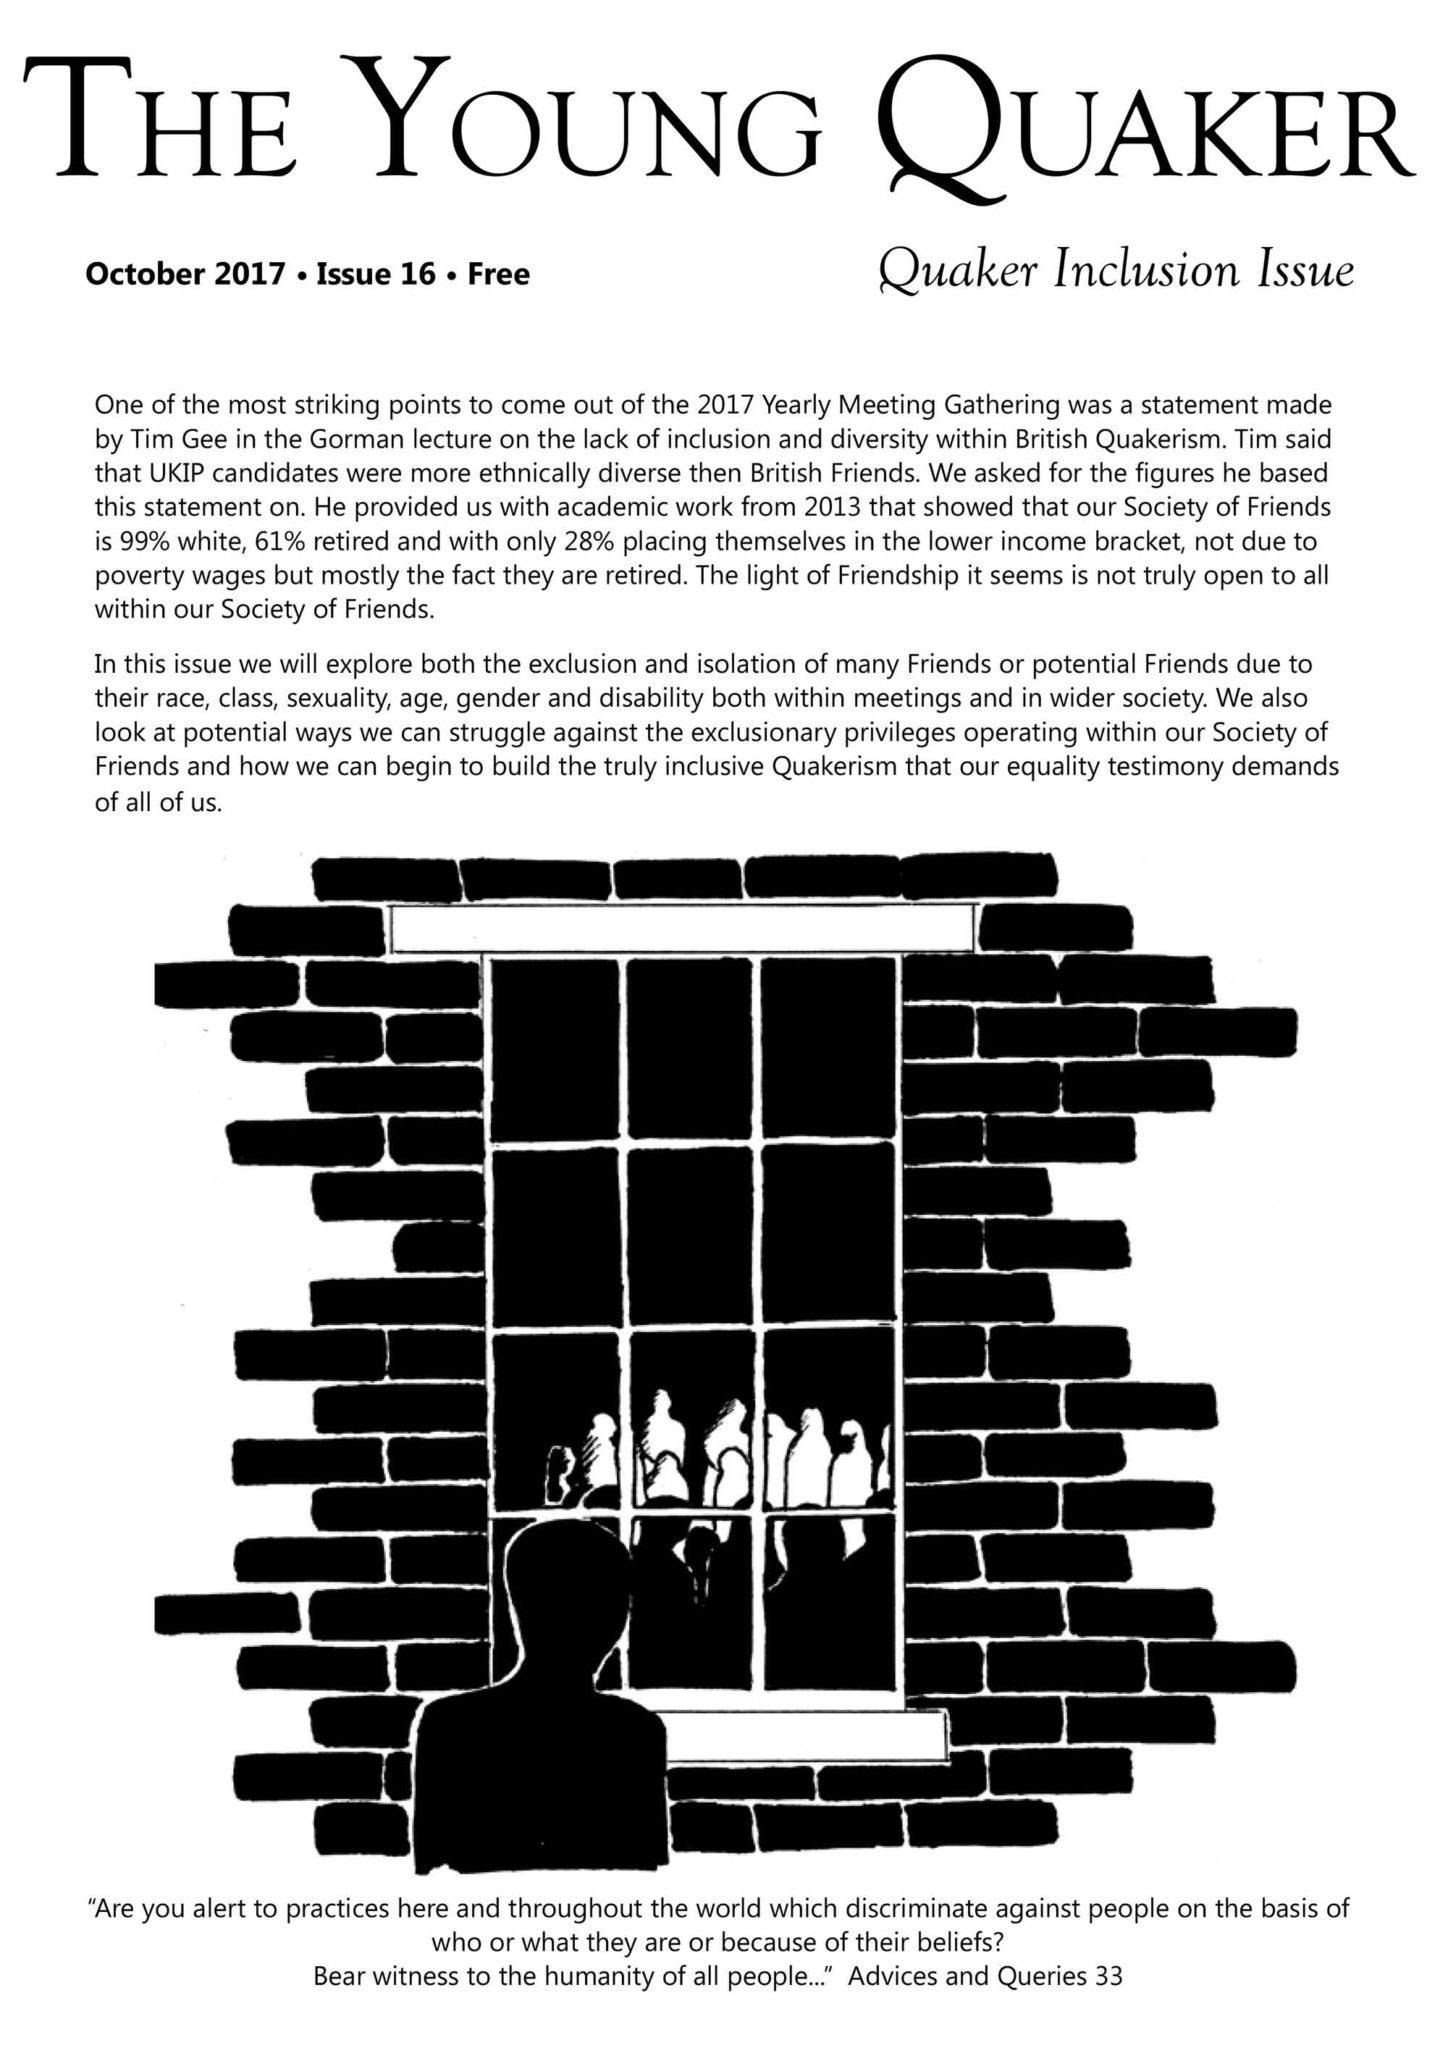 Issue 16: October 2017 – Quaker Inclusion Issue